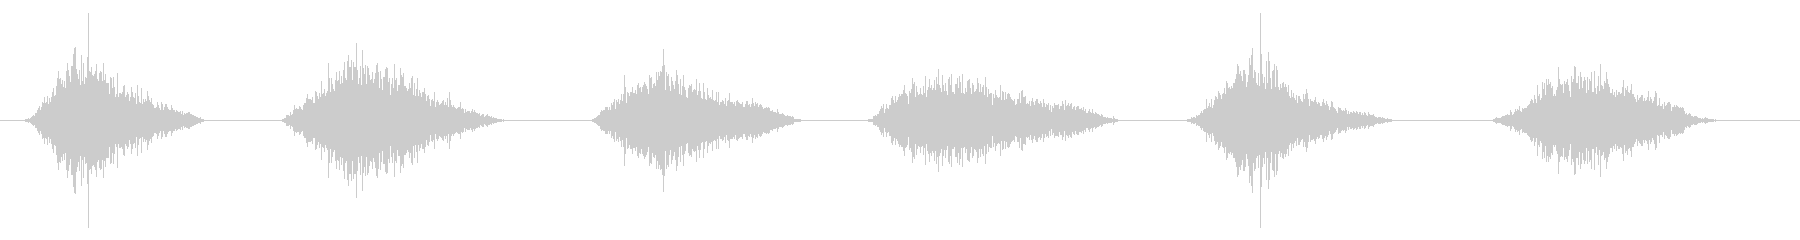 PC マウス ムーブ04-16(ハード)の未再生の波形